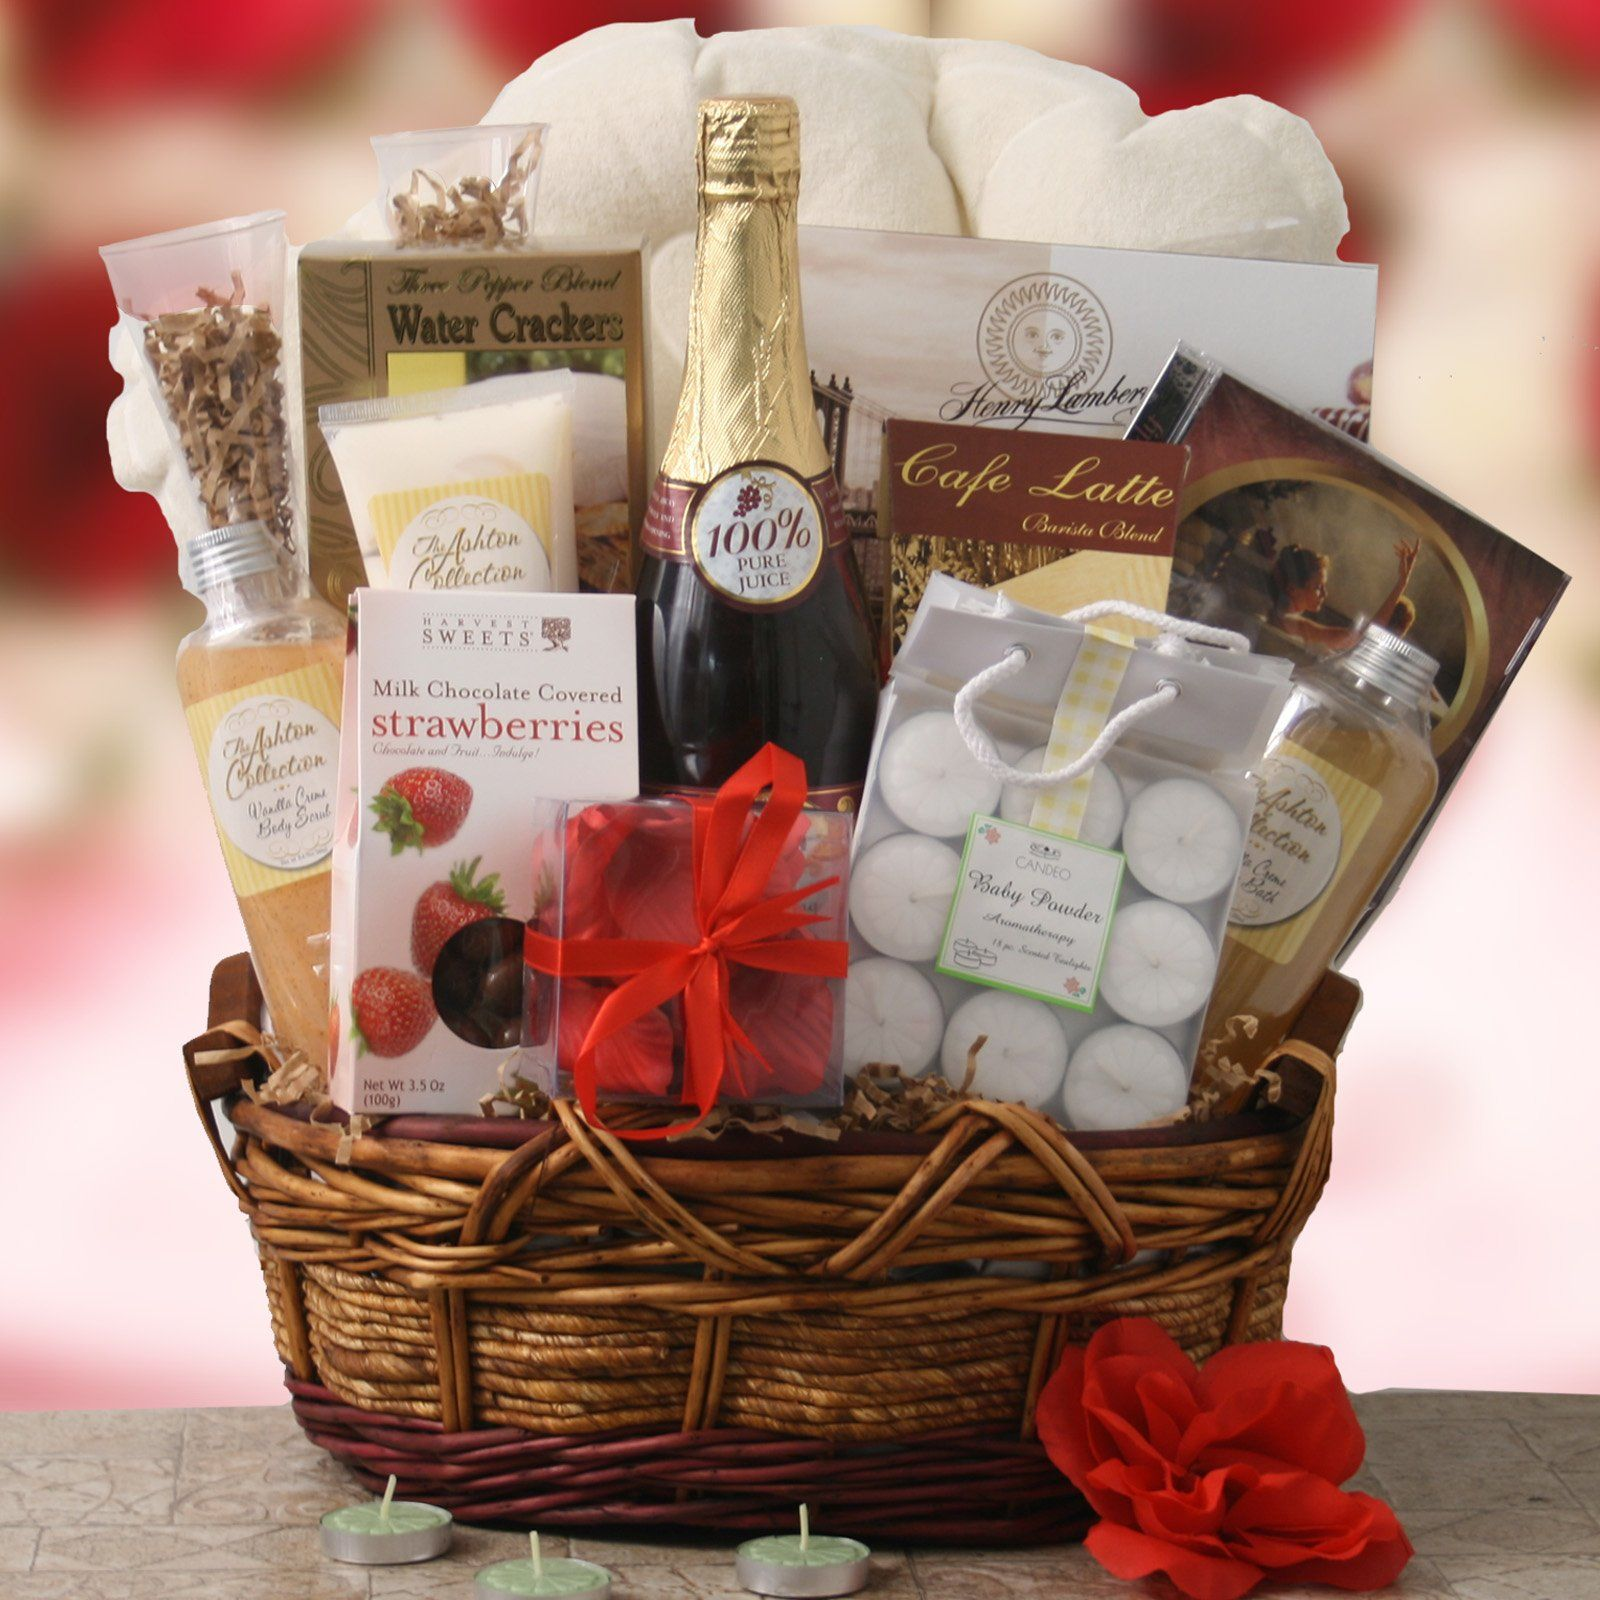 Honeymoon Gift Basket Ideas Honeymoon gift baskets